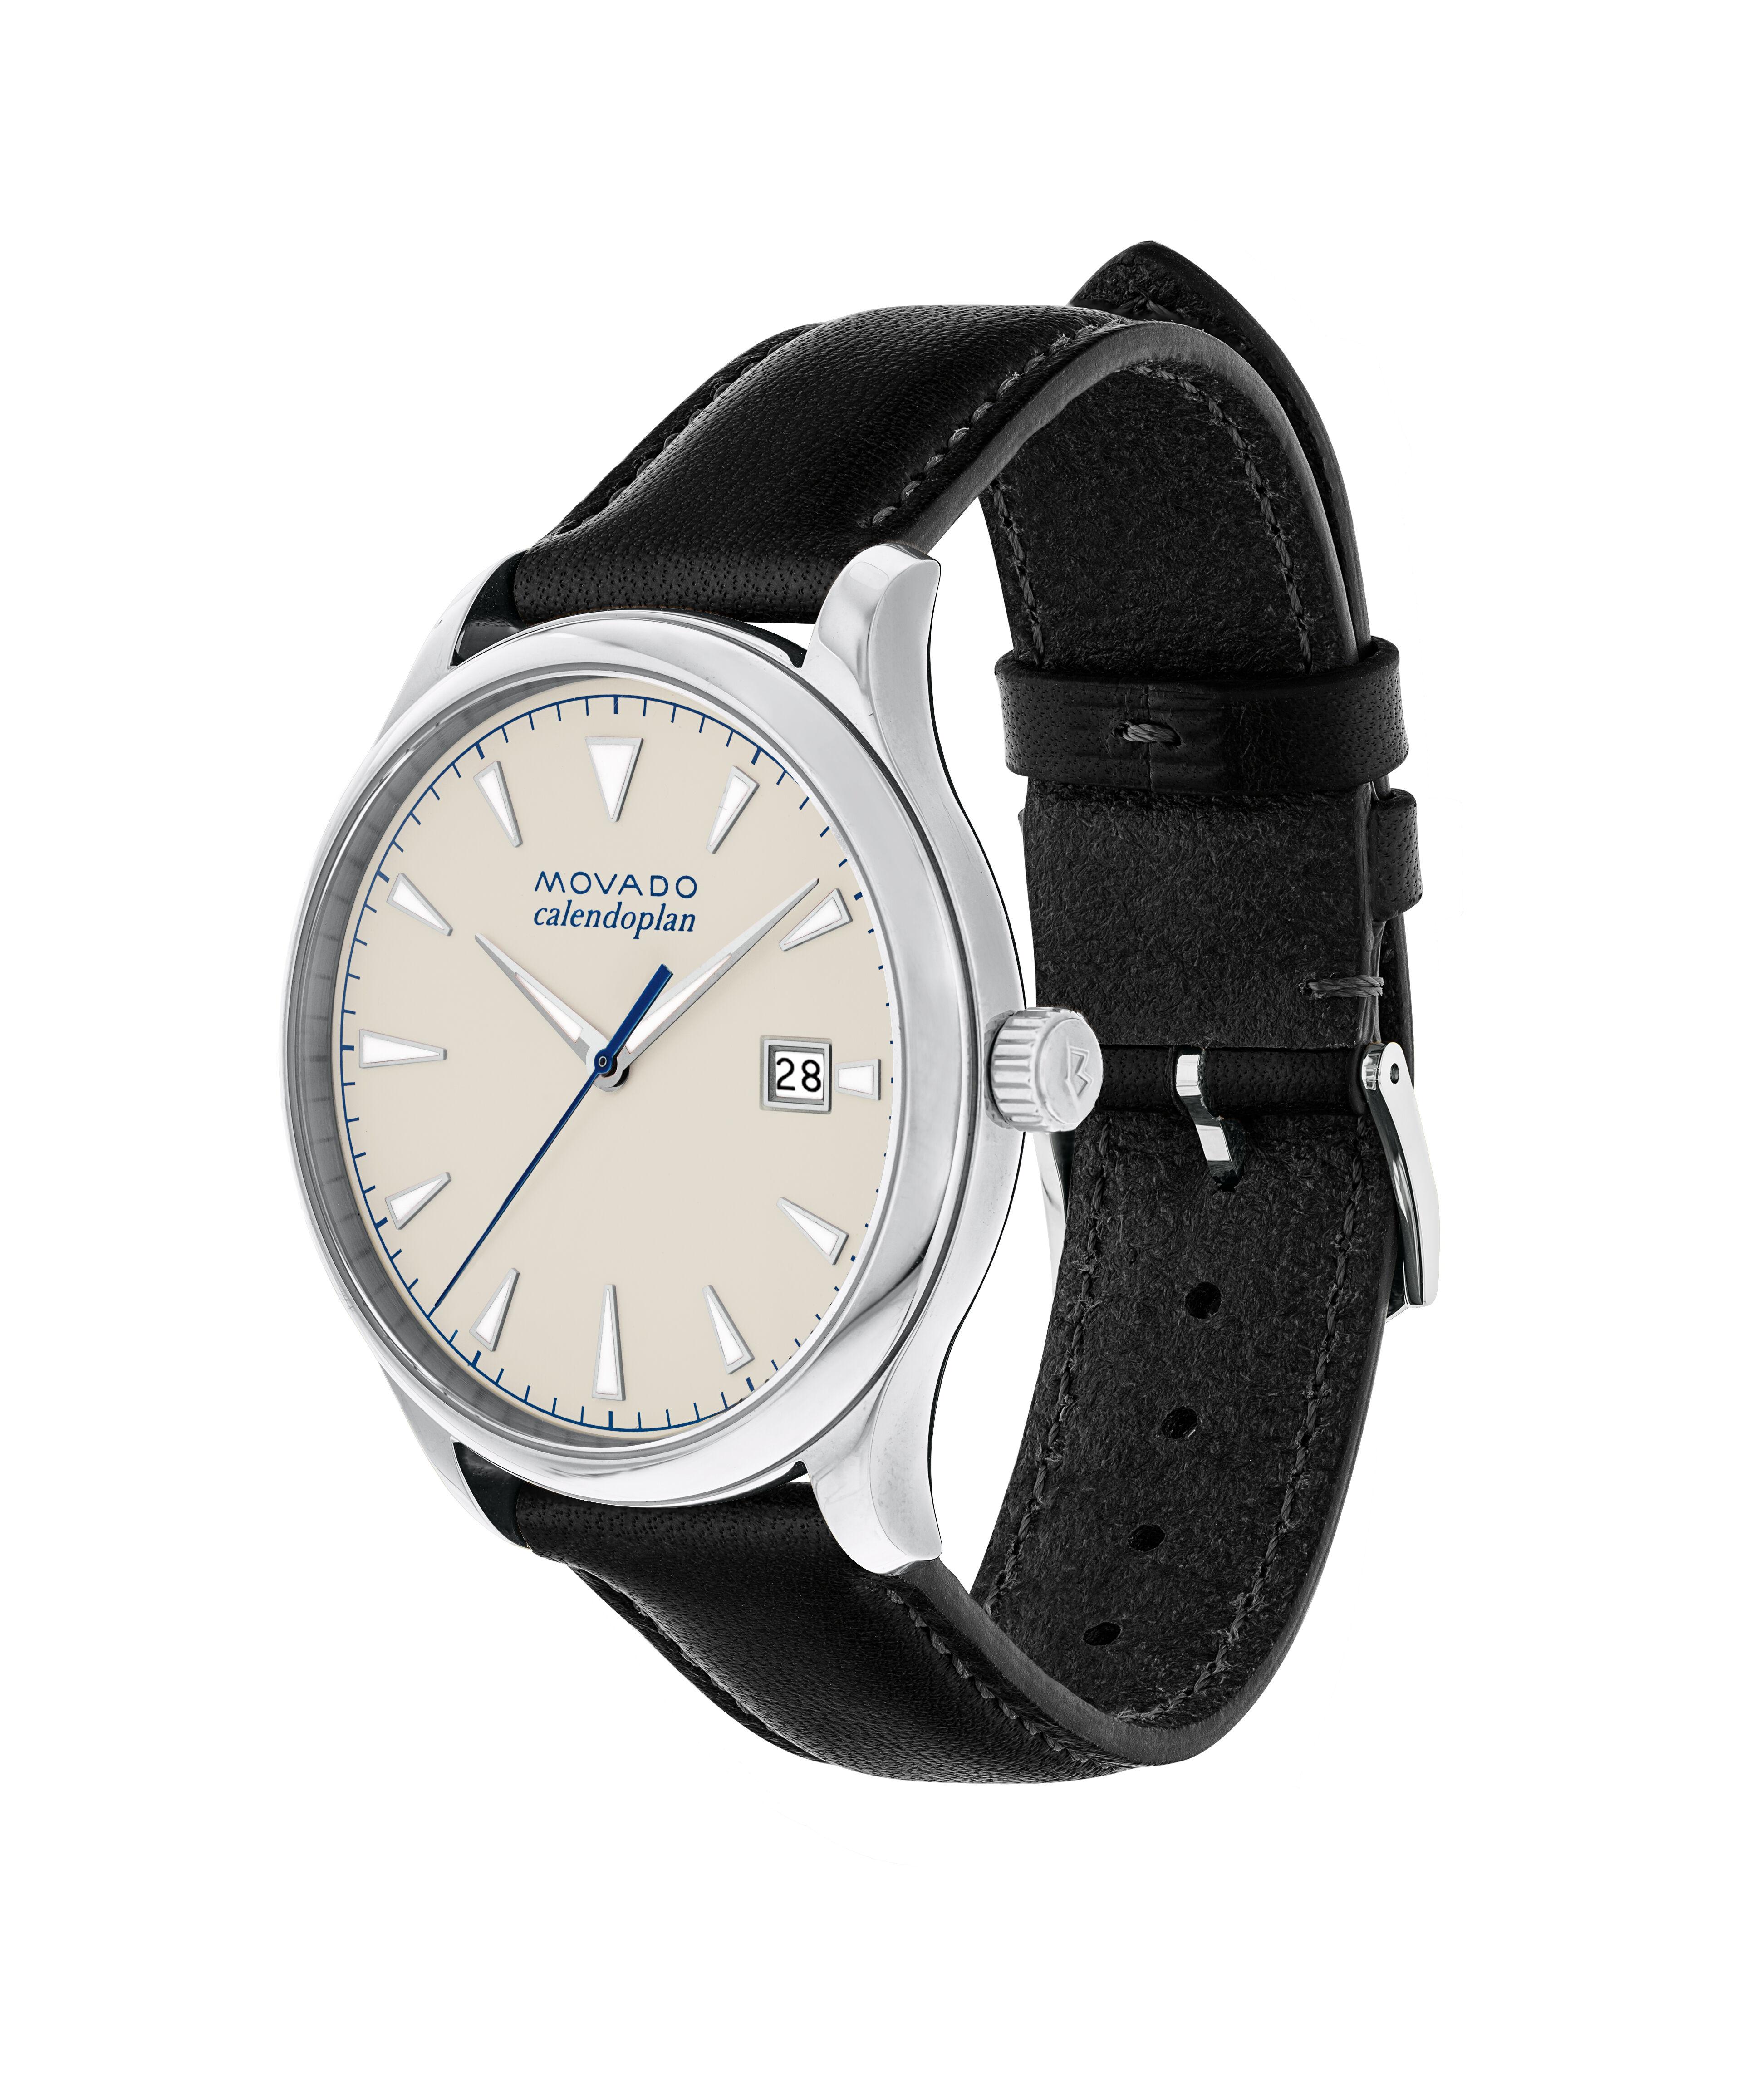 How To Spot Fake Ferrari Watch 31041 E